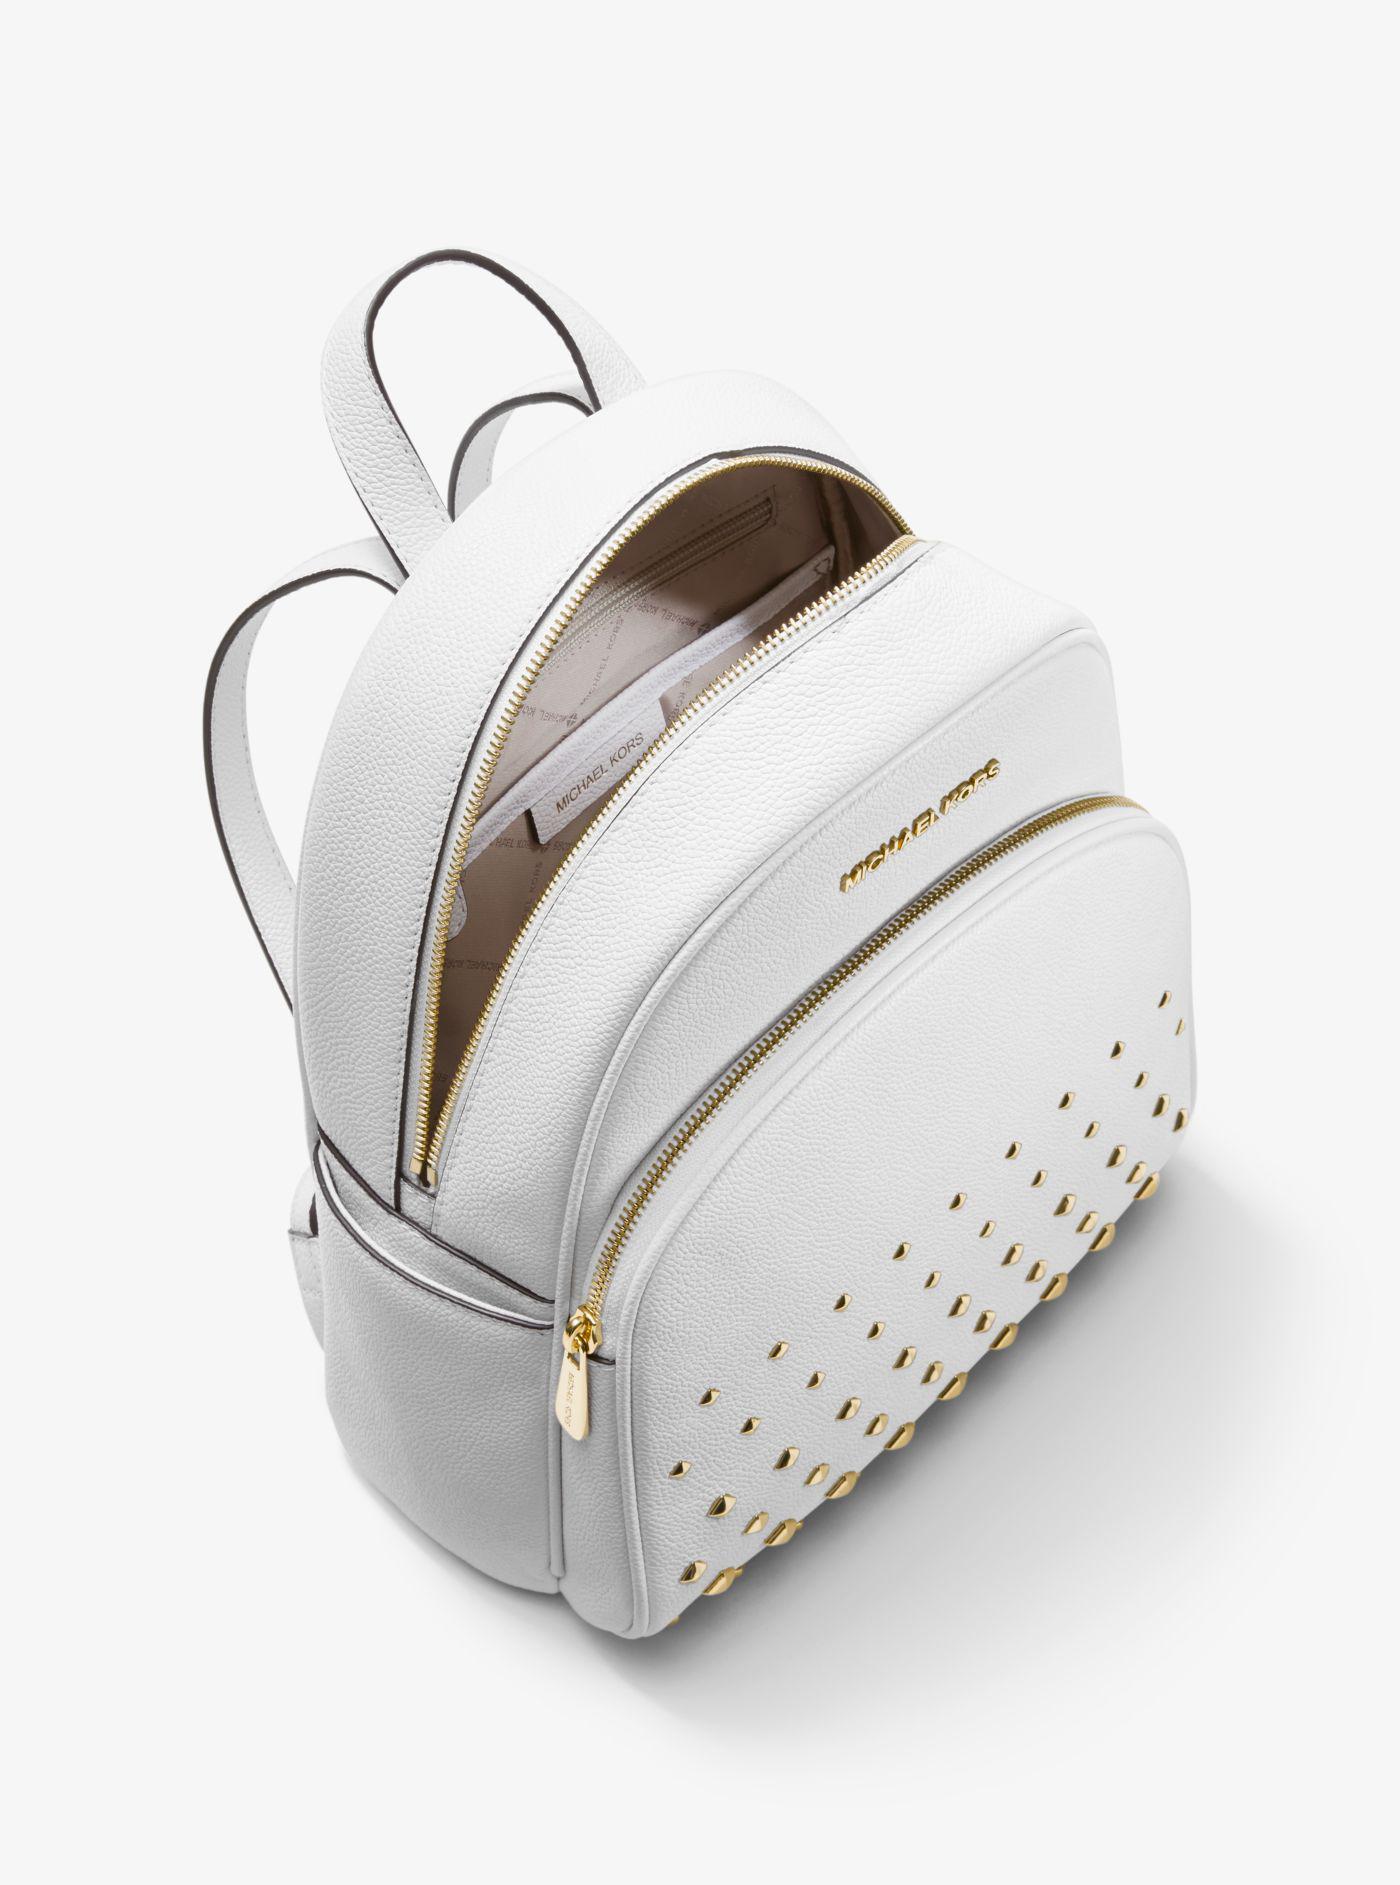 Michael Kors - White Abbey Medium Studded Pebbled Leather Backpack - Lyst.  View fullscreen 014e0cd641591